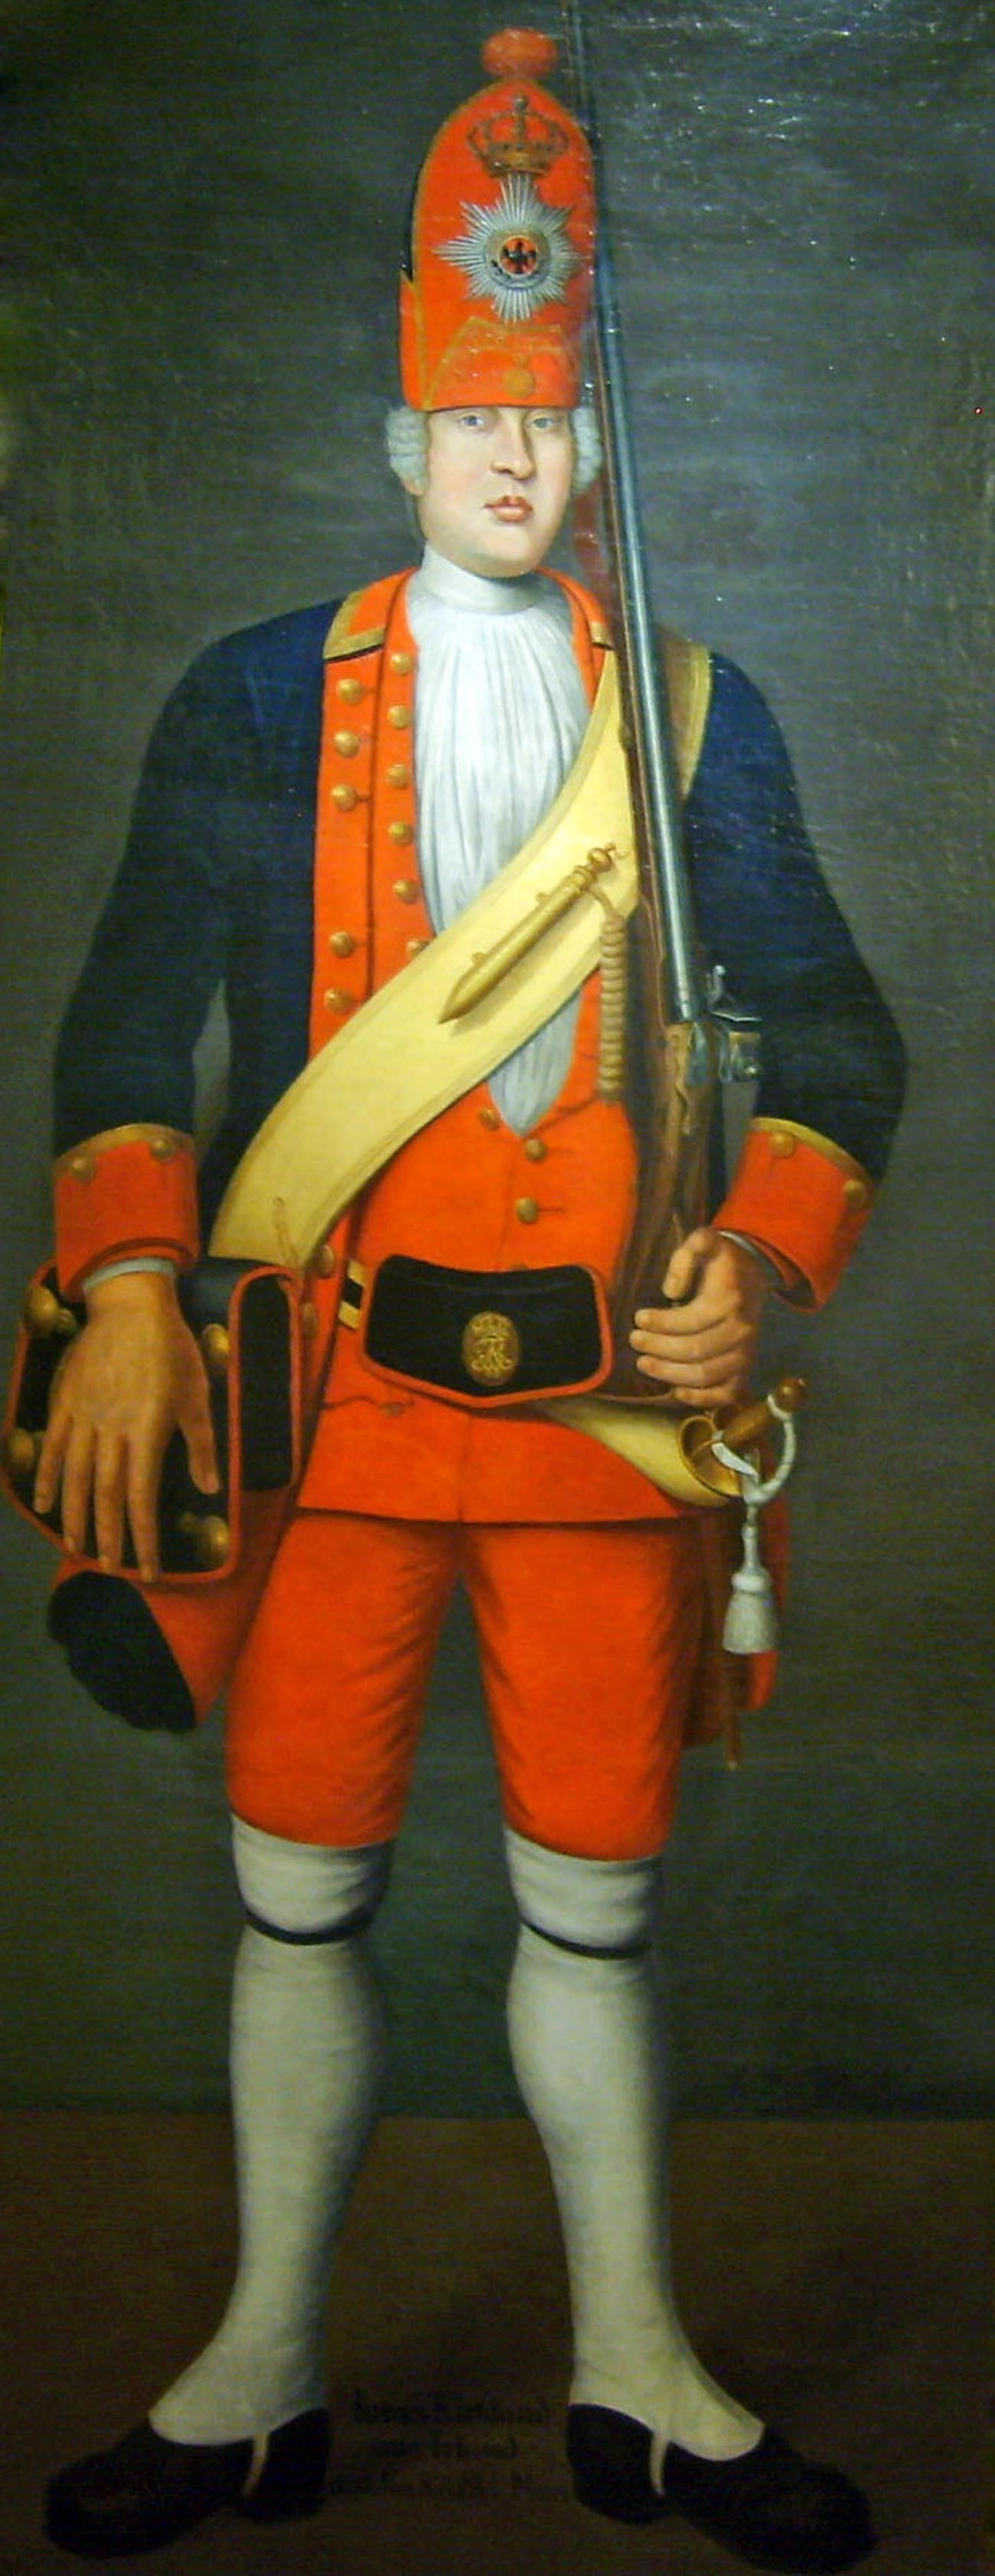 The portrait of James Kirkland from Ireland of the Potsdam Giants by Johann Christof Merck